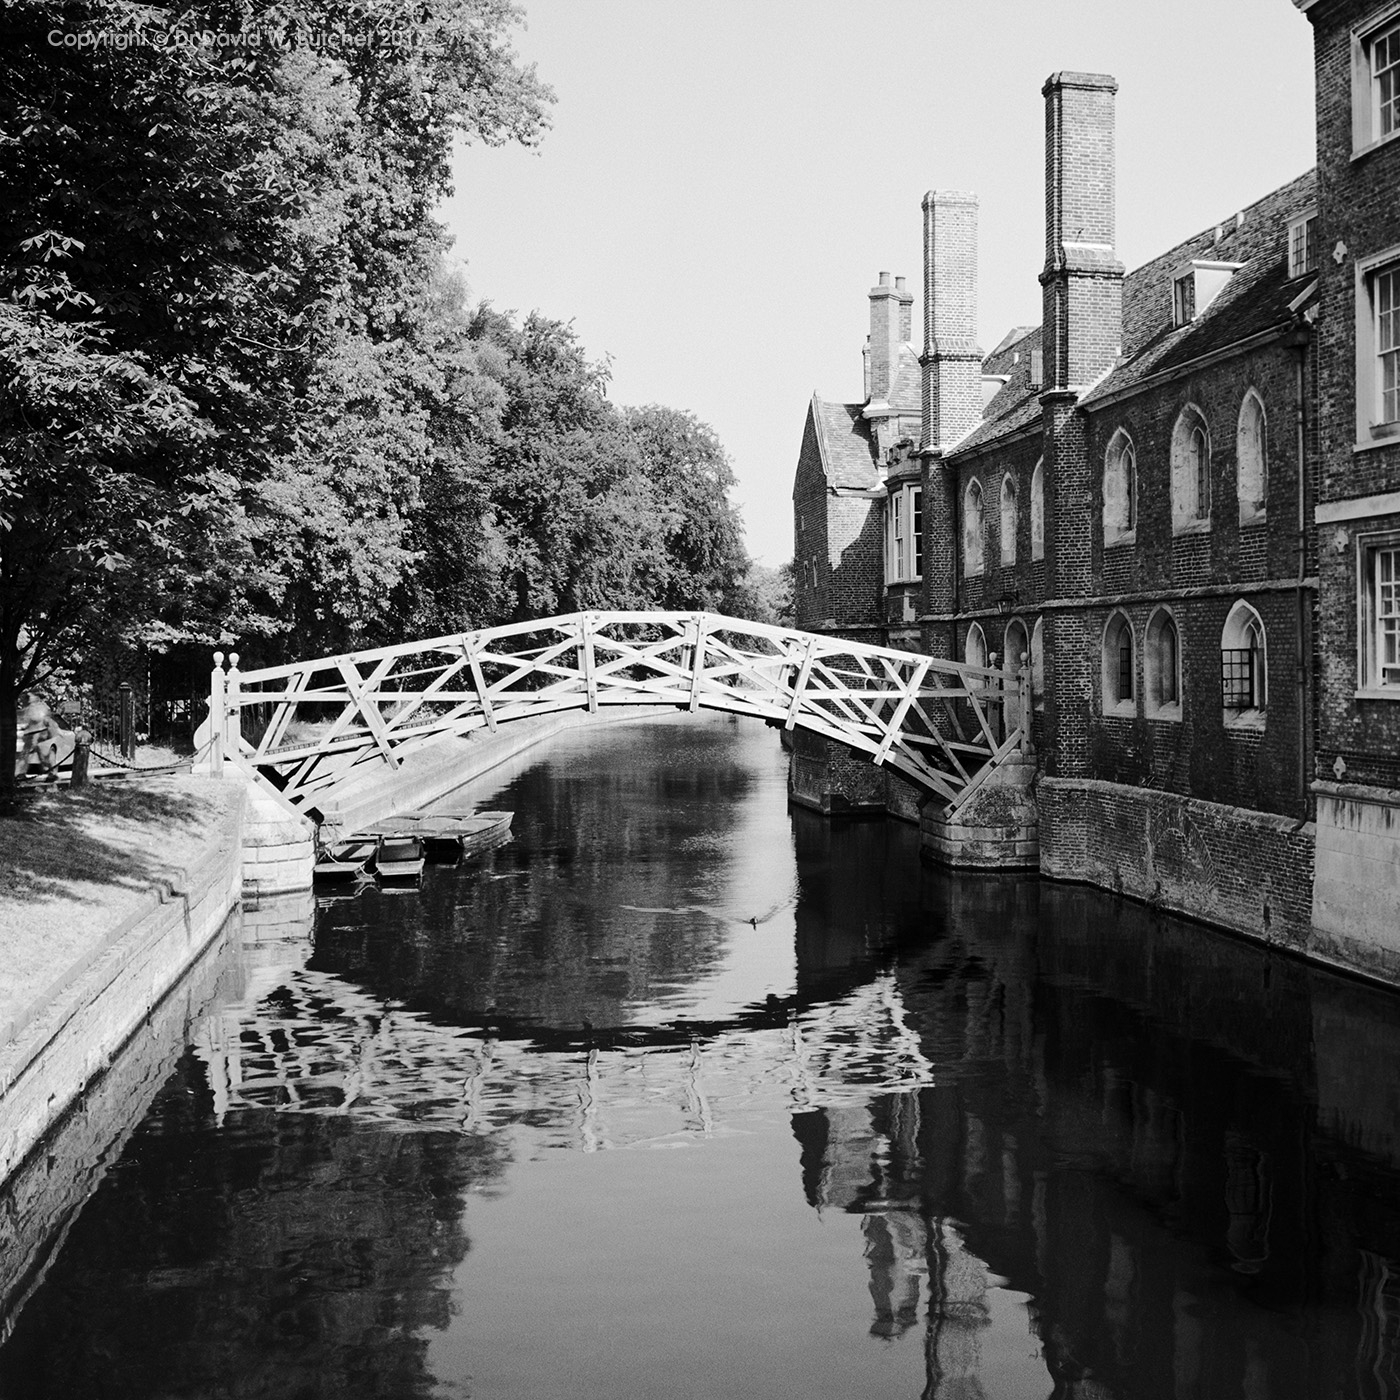 Cambridge Queens' College Mathematical Bridge Reflections, England